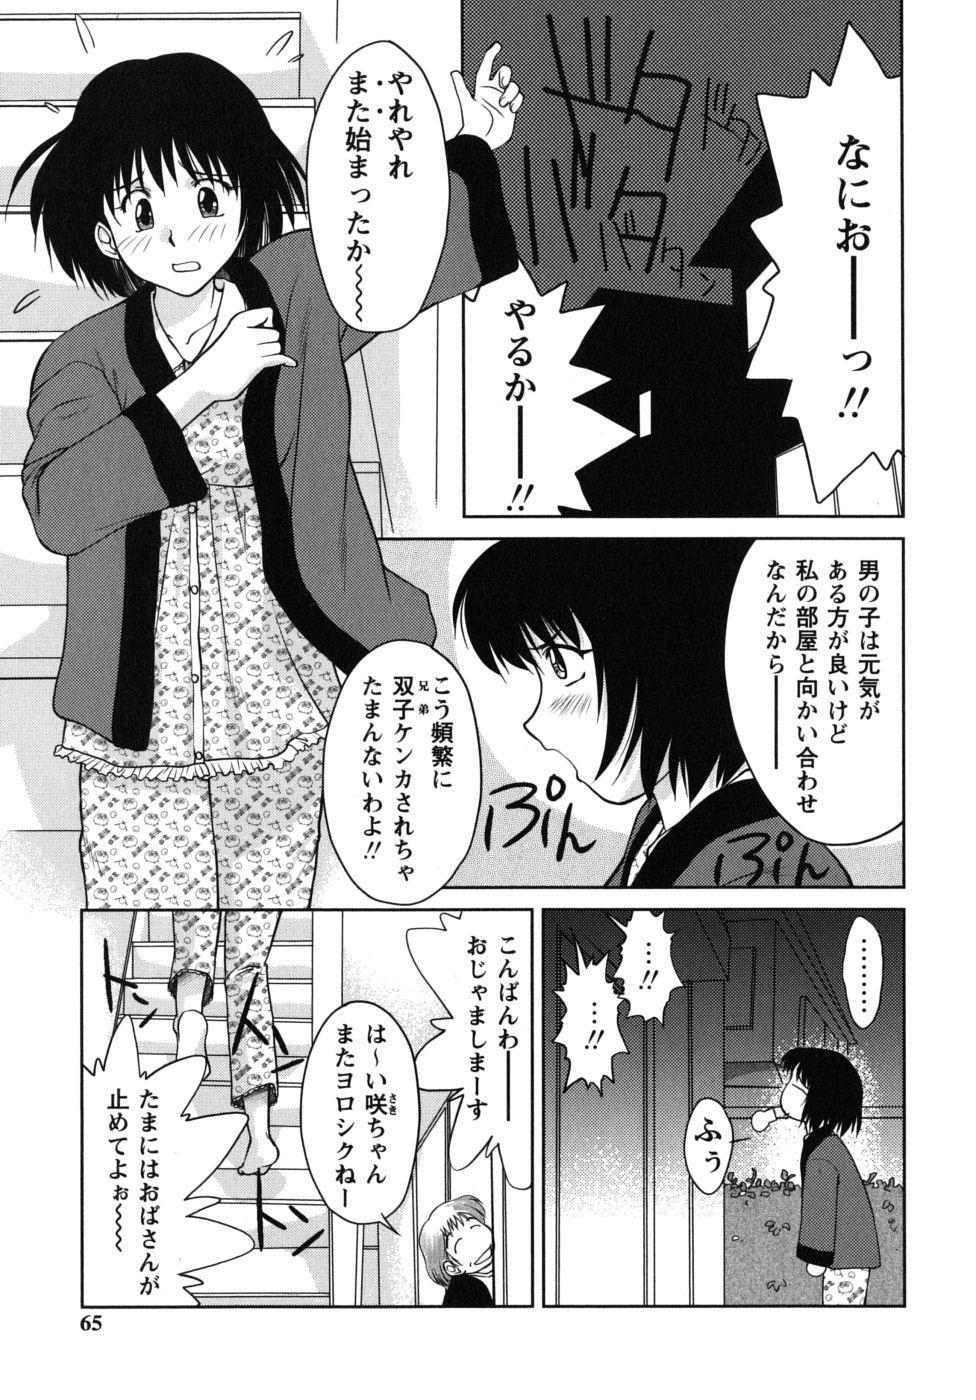 Futa Go Ecchi 64